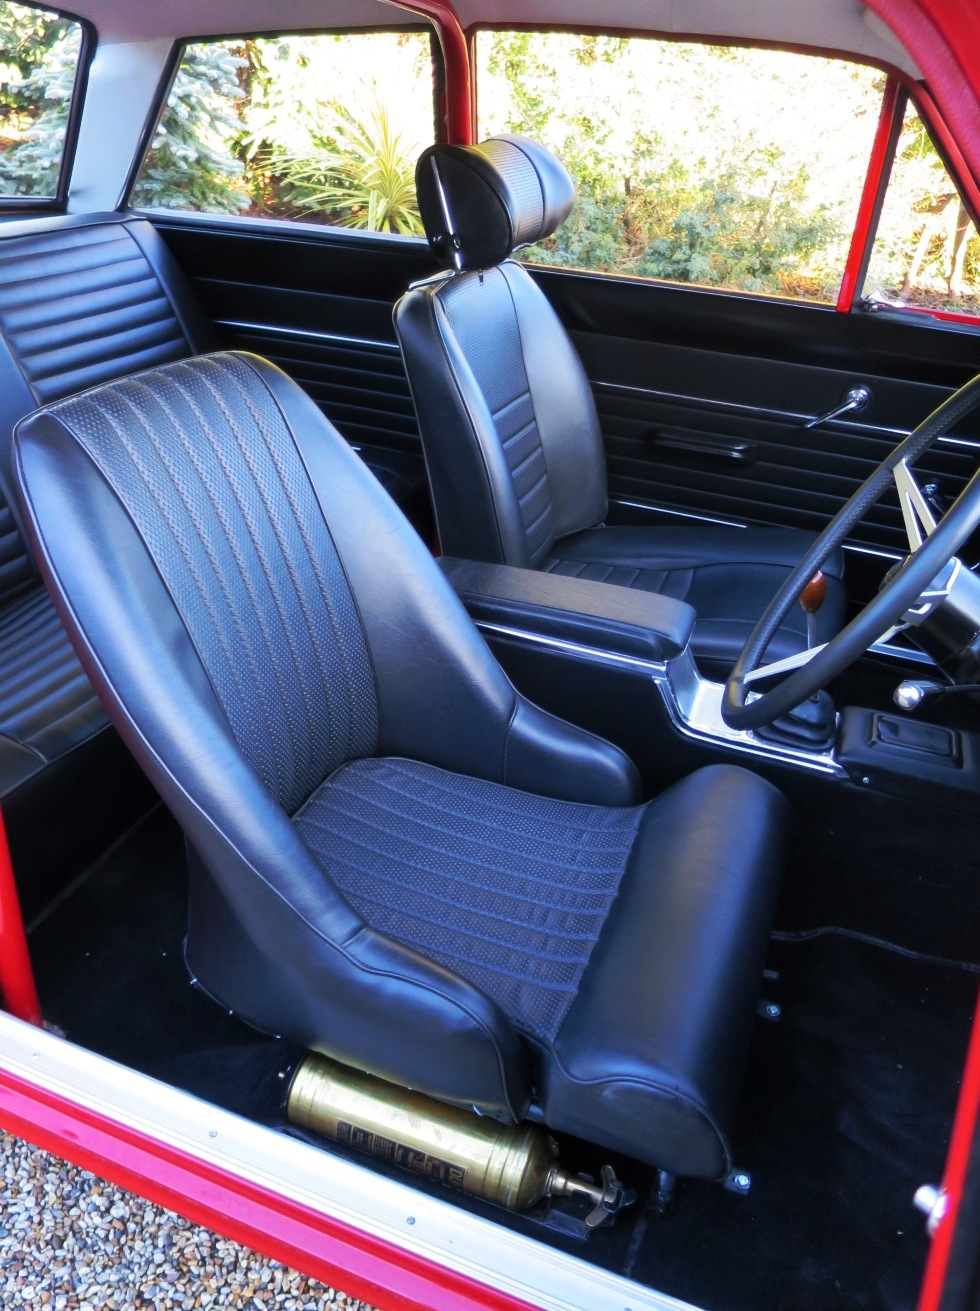 Lotus Cortina Mk1 Aeroflow A Frame Monaco Red 7